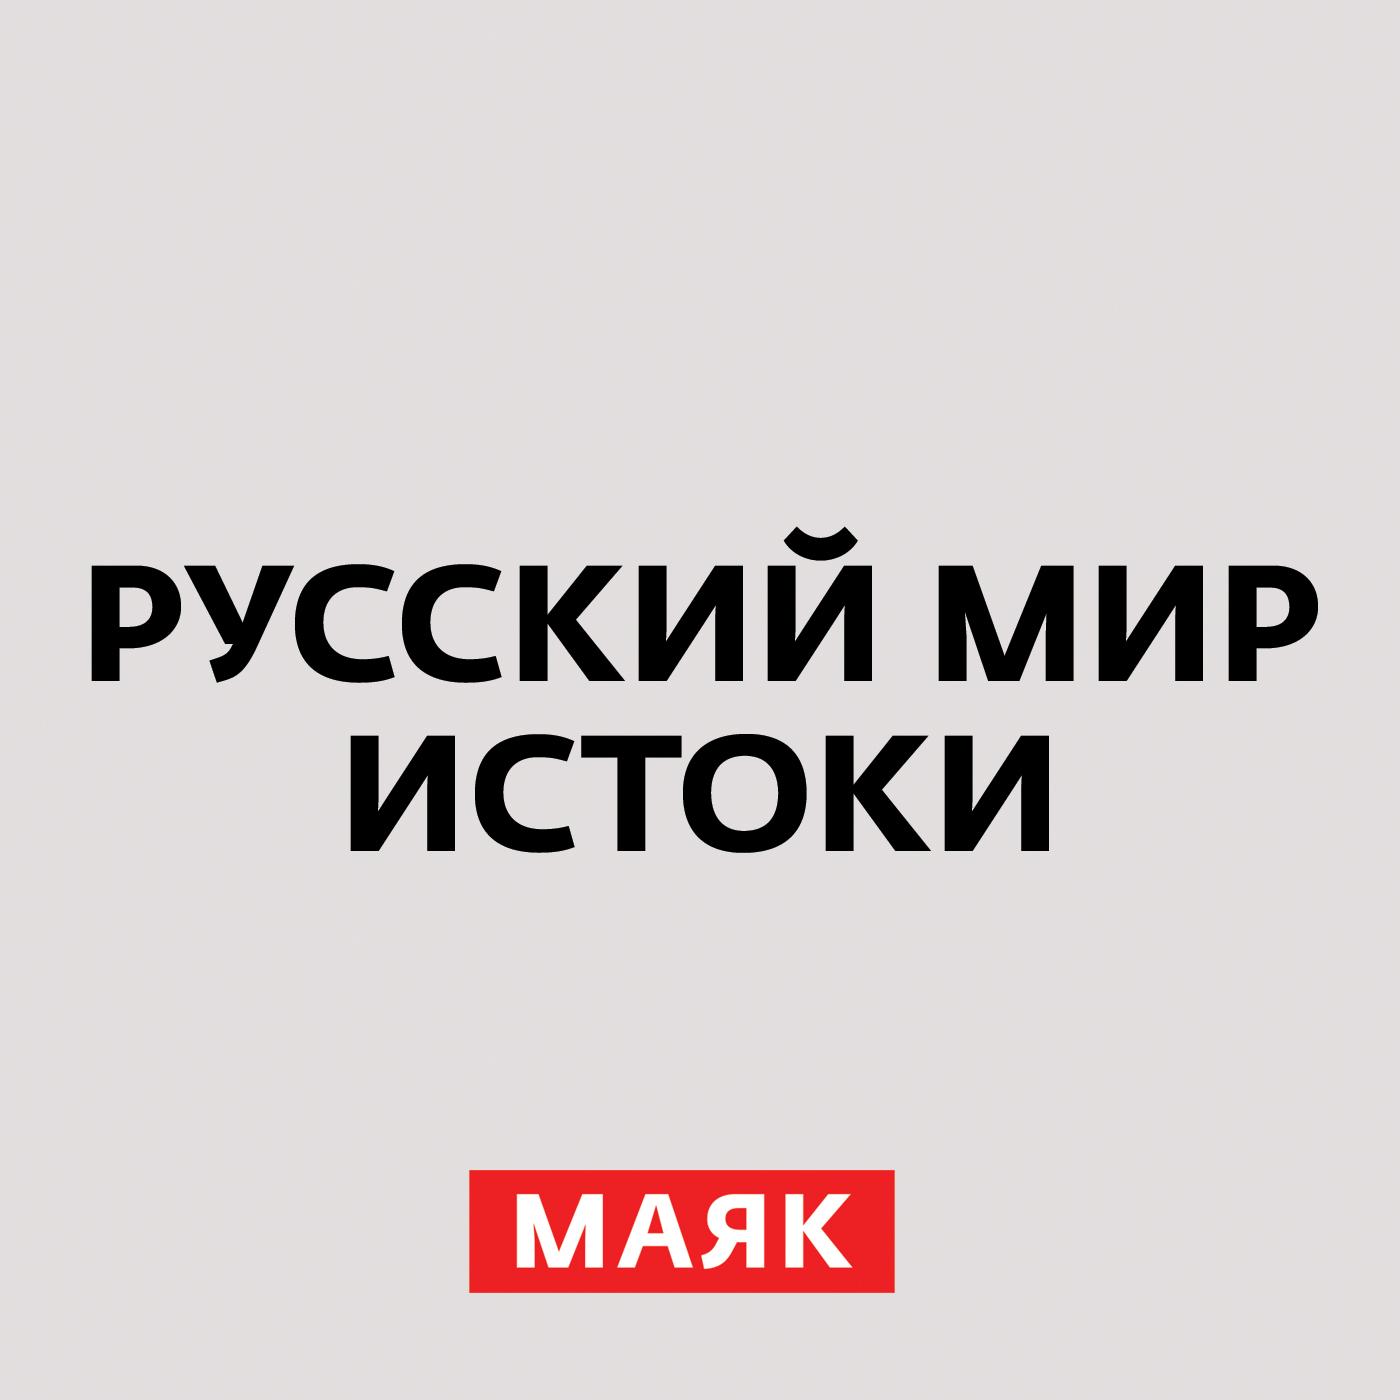 Творческий коллектив радио «Маяк» Василий III творческий коллектив радио маяк теща